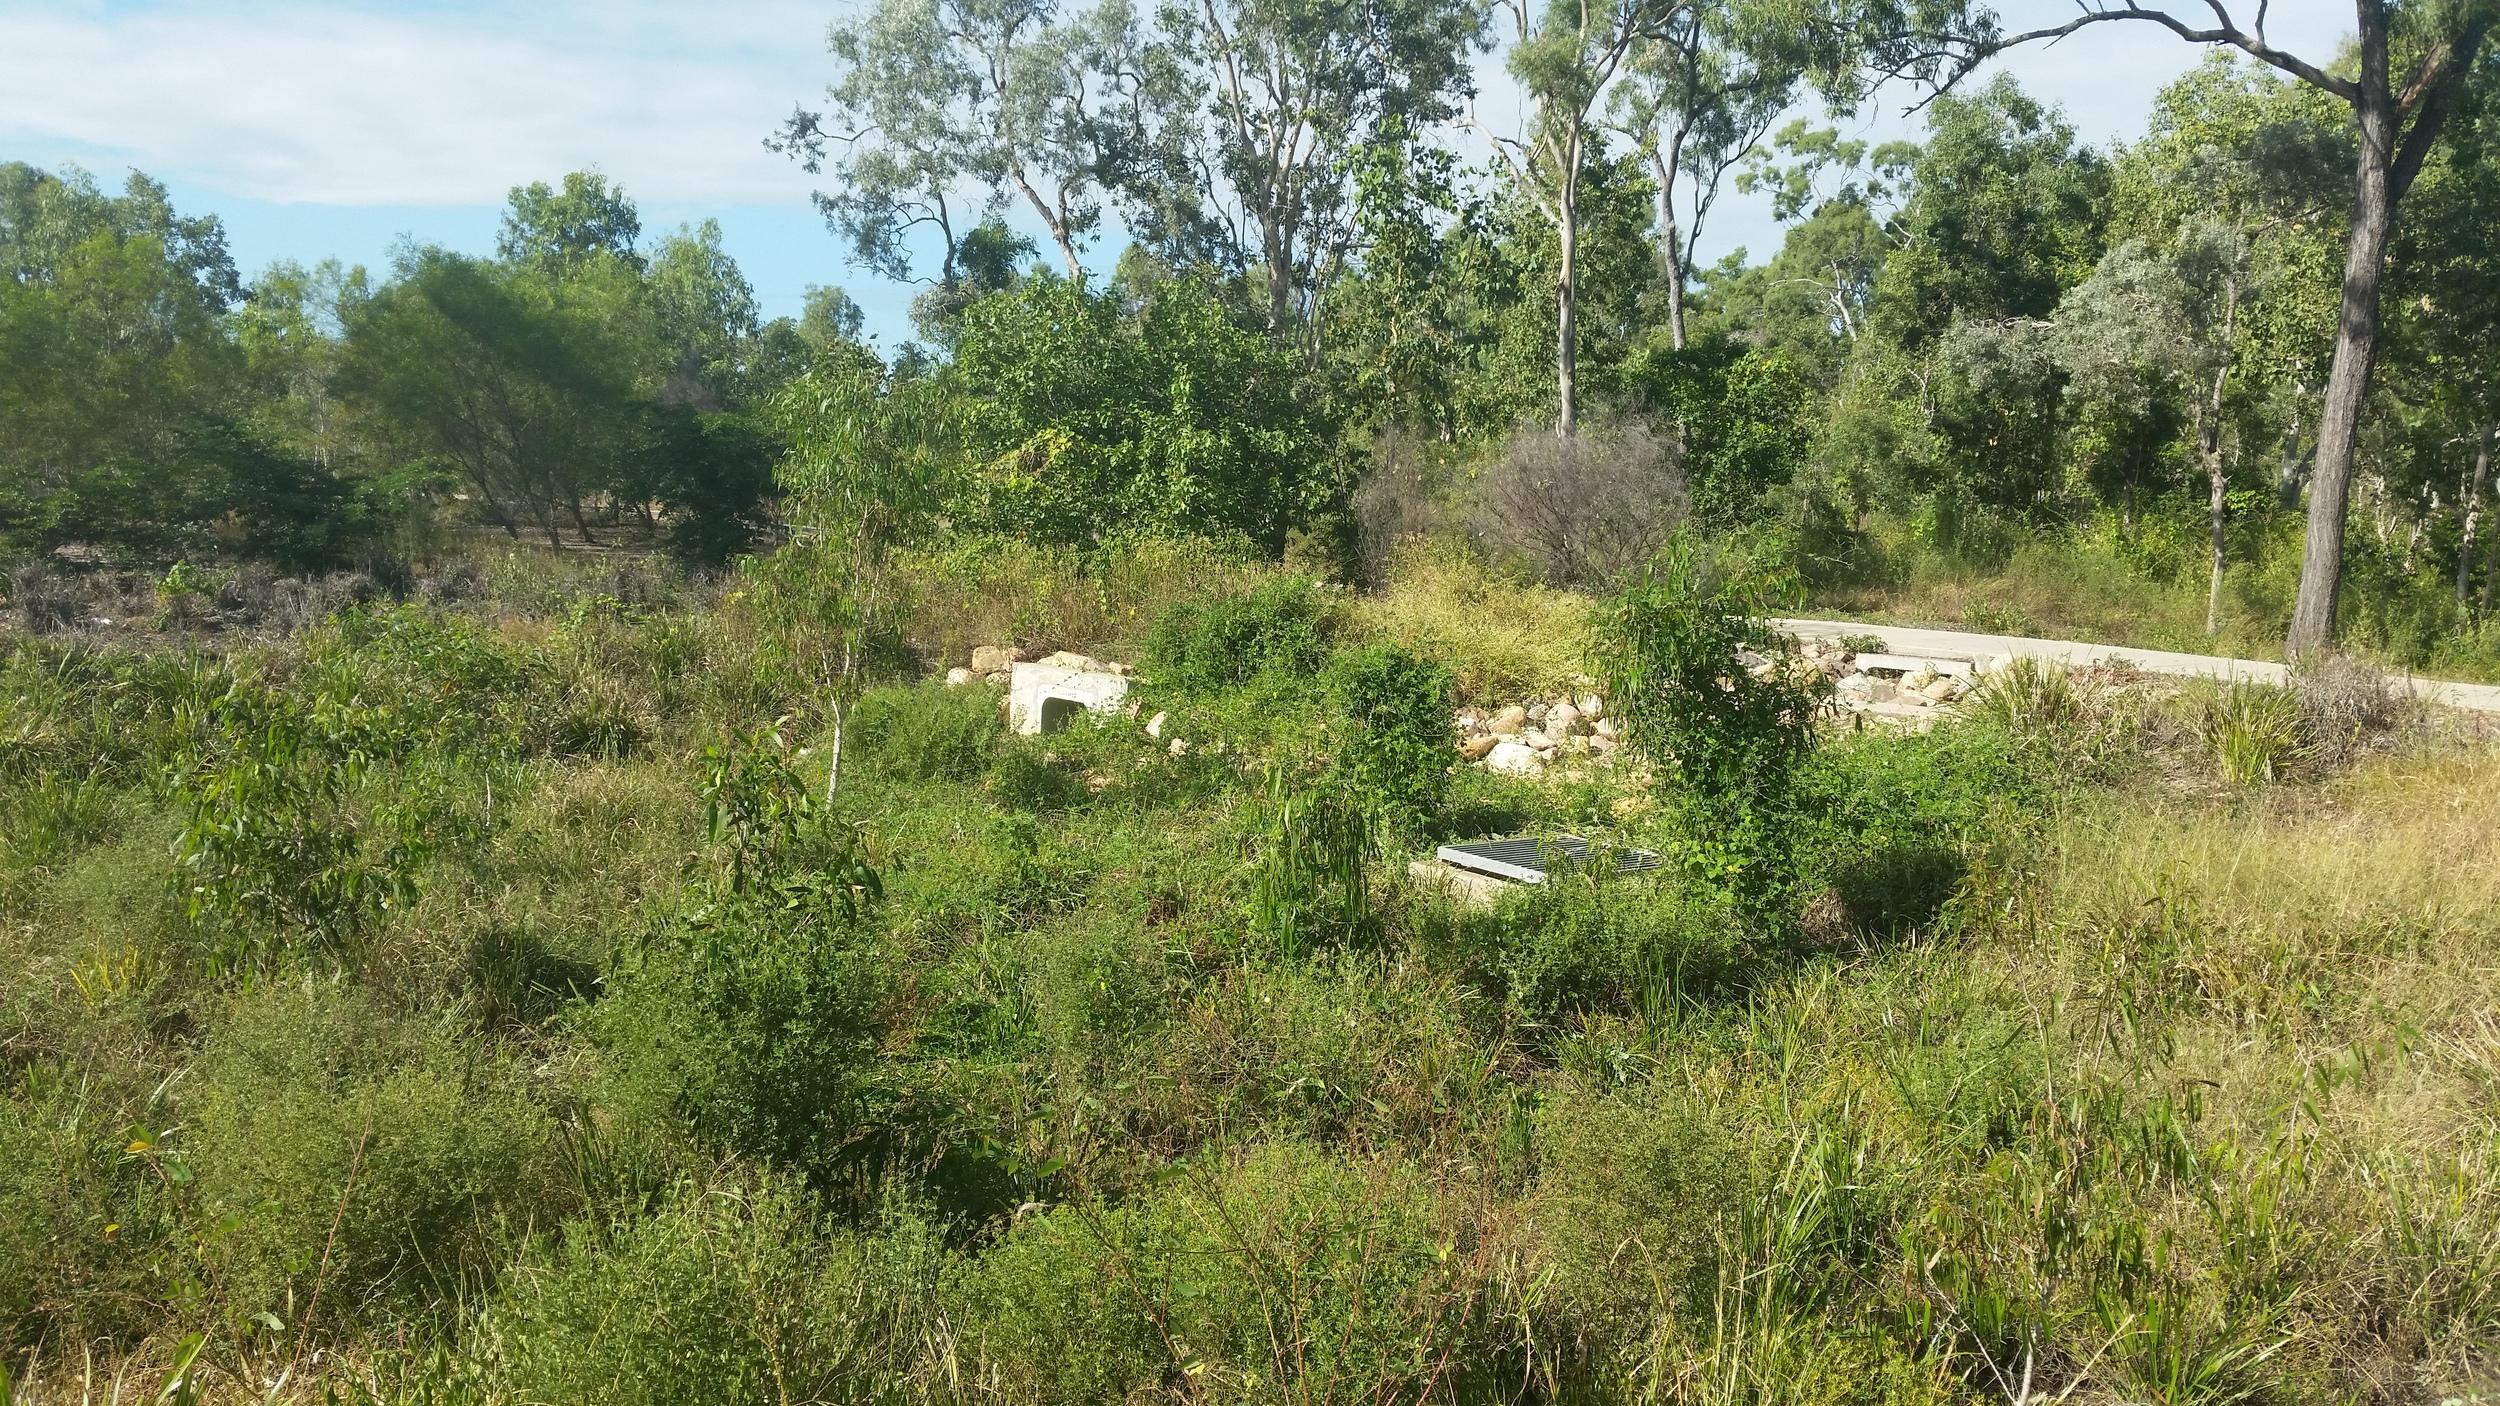 Yalbira Avenue Bioretention System